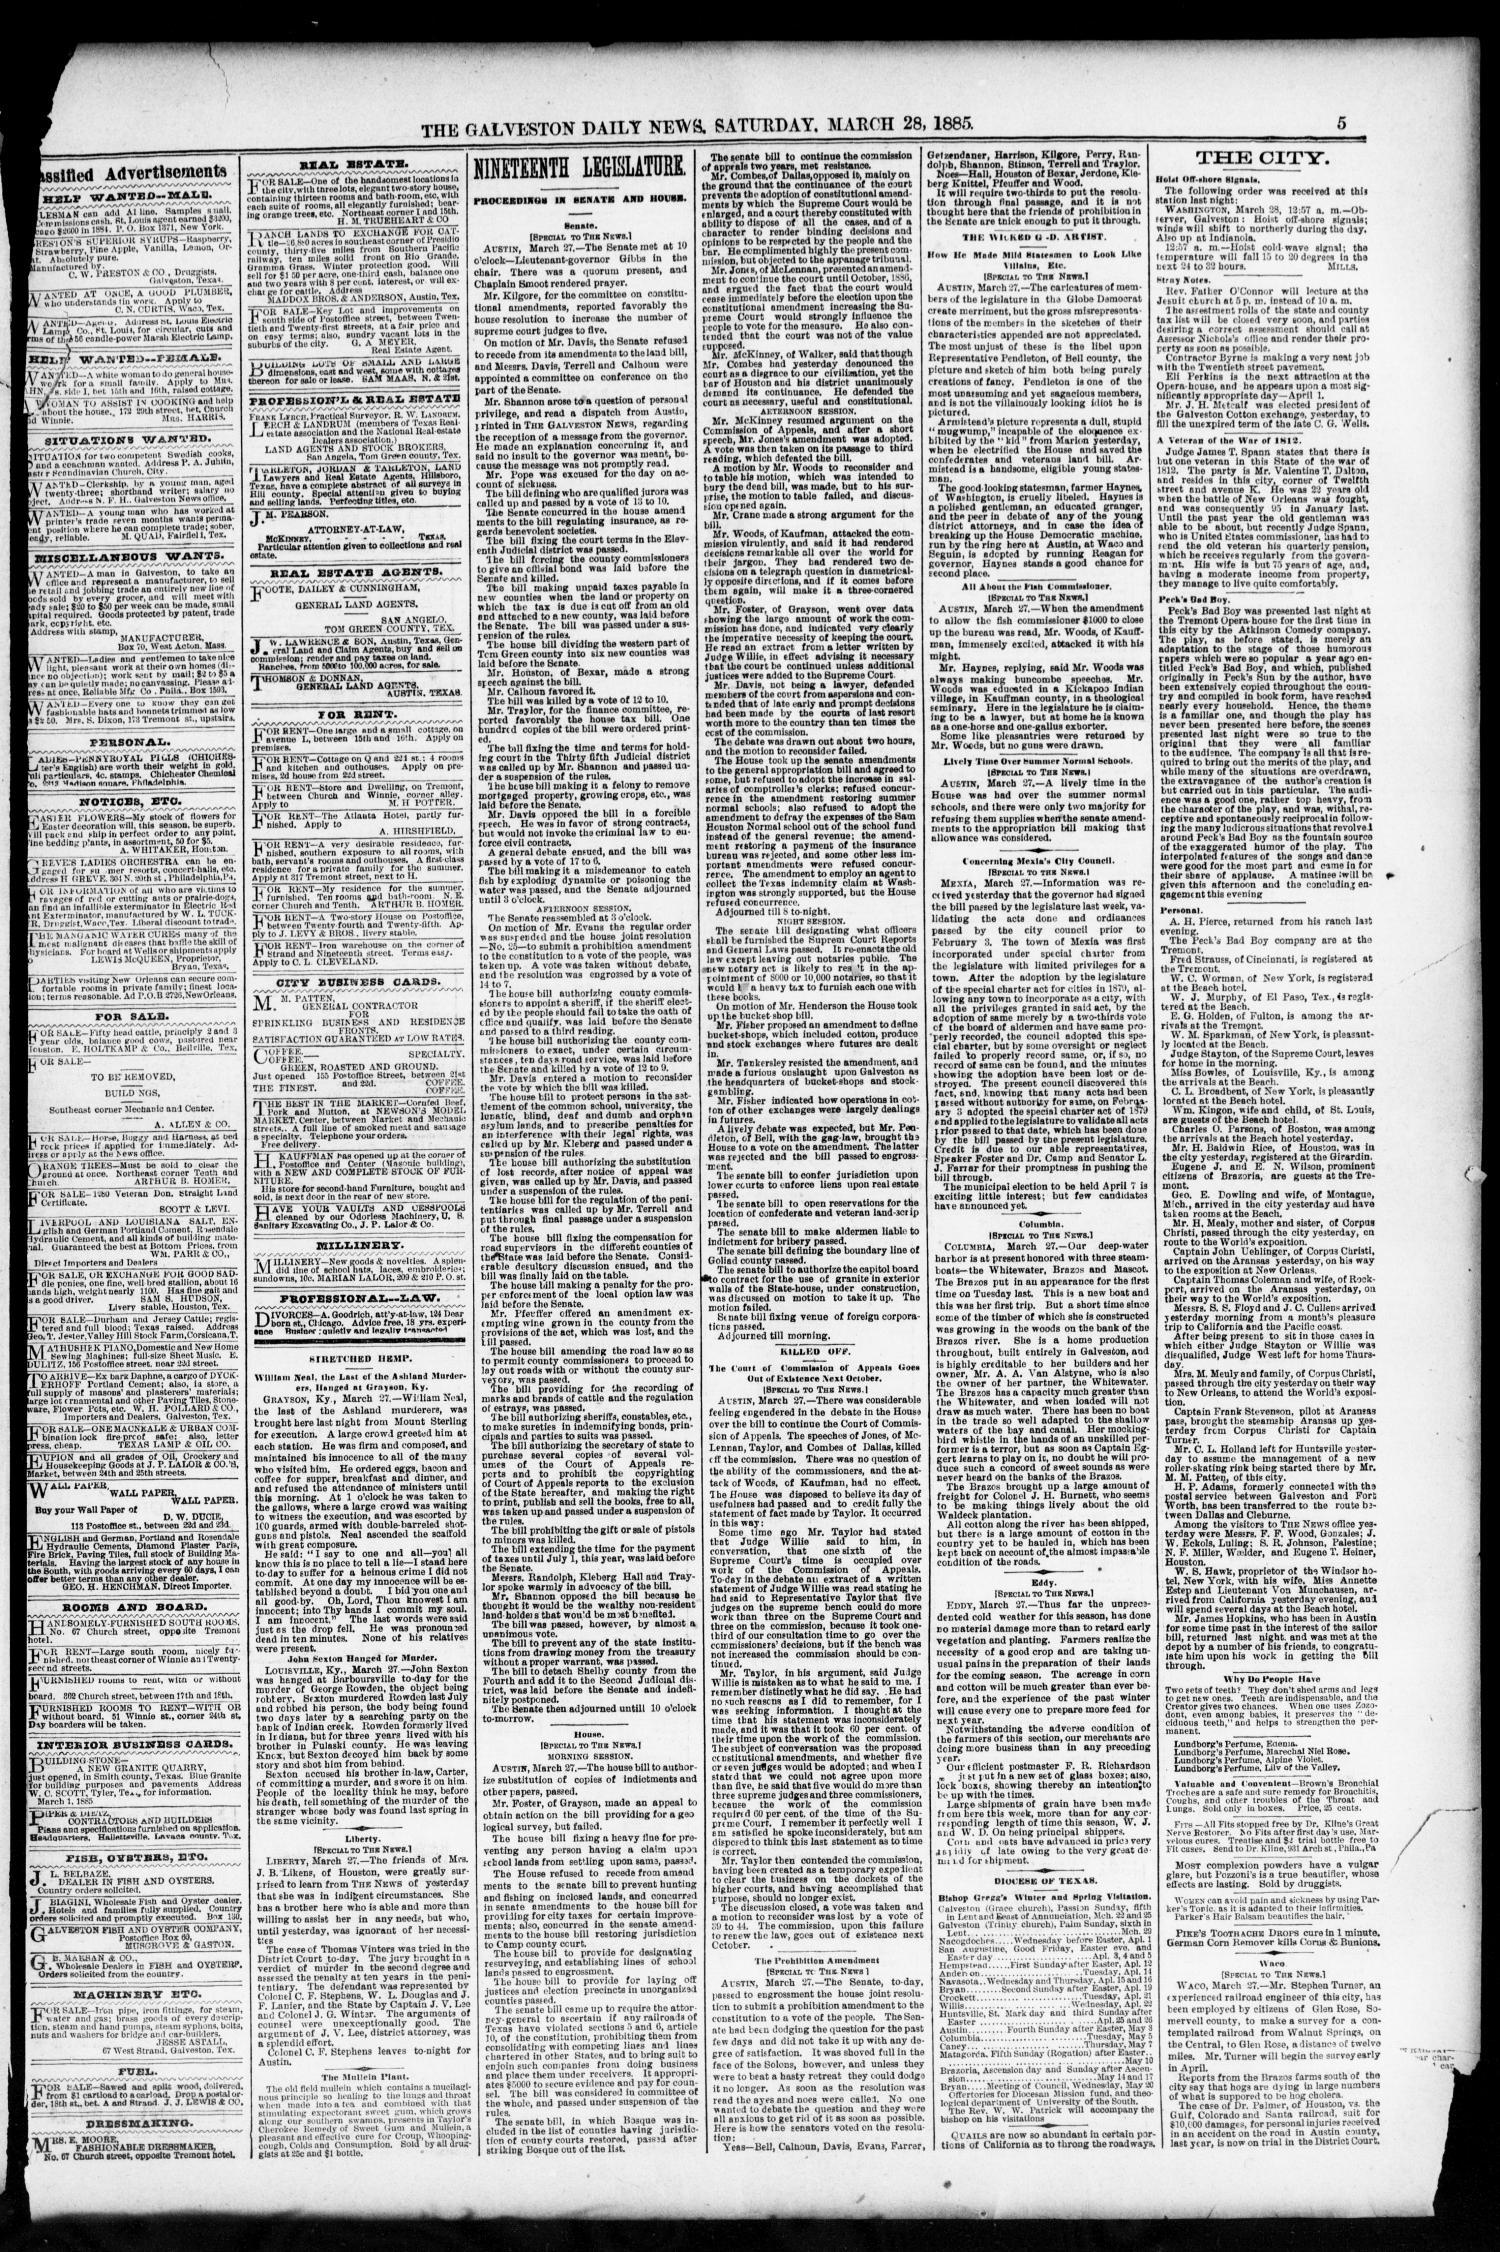 The Galveston Daily News  (Galveston, Tex ), Vol  43, No  338, Ed  1